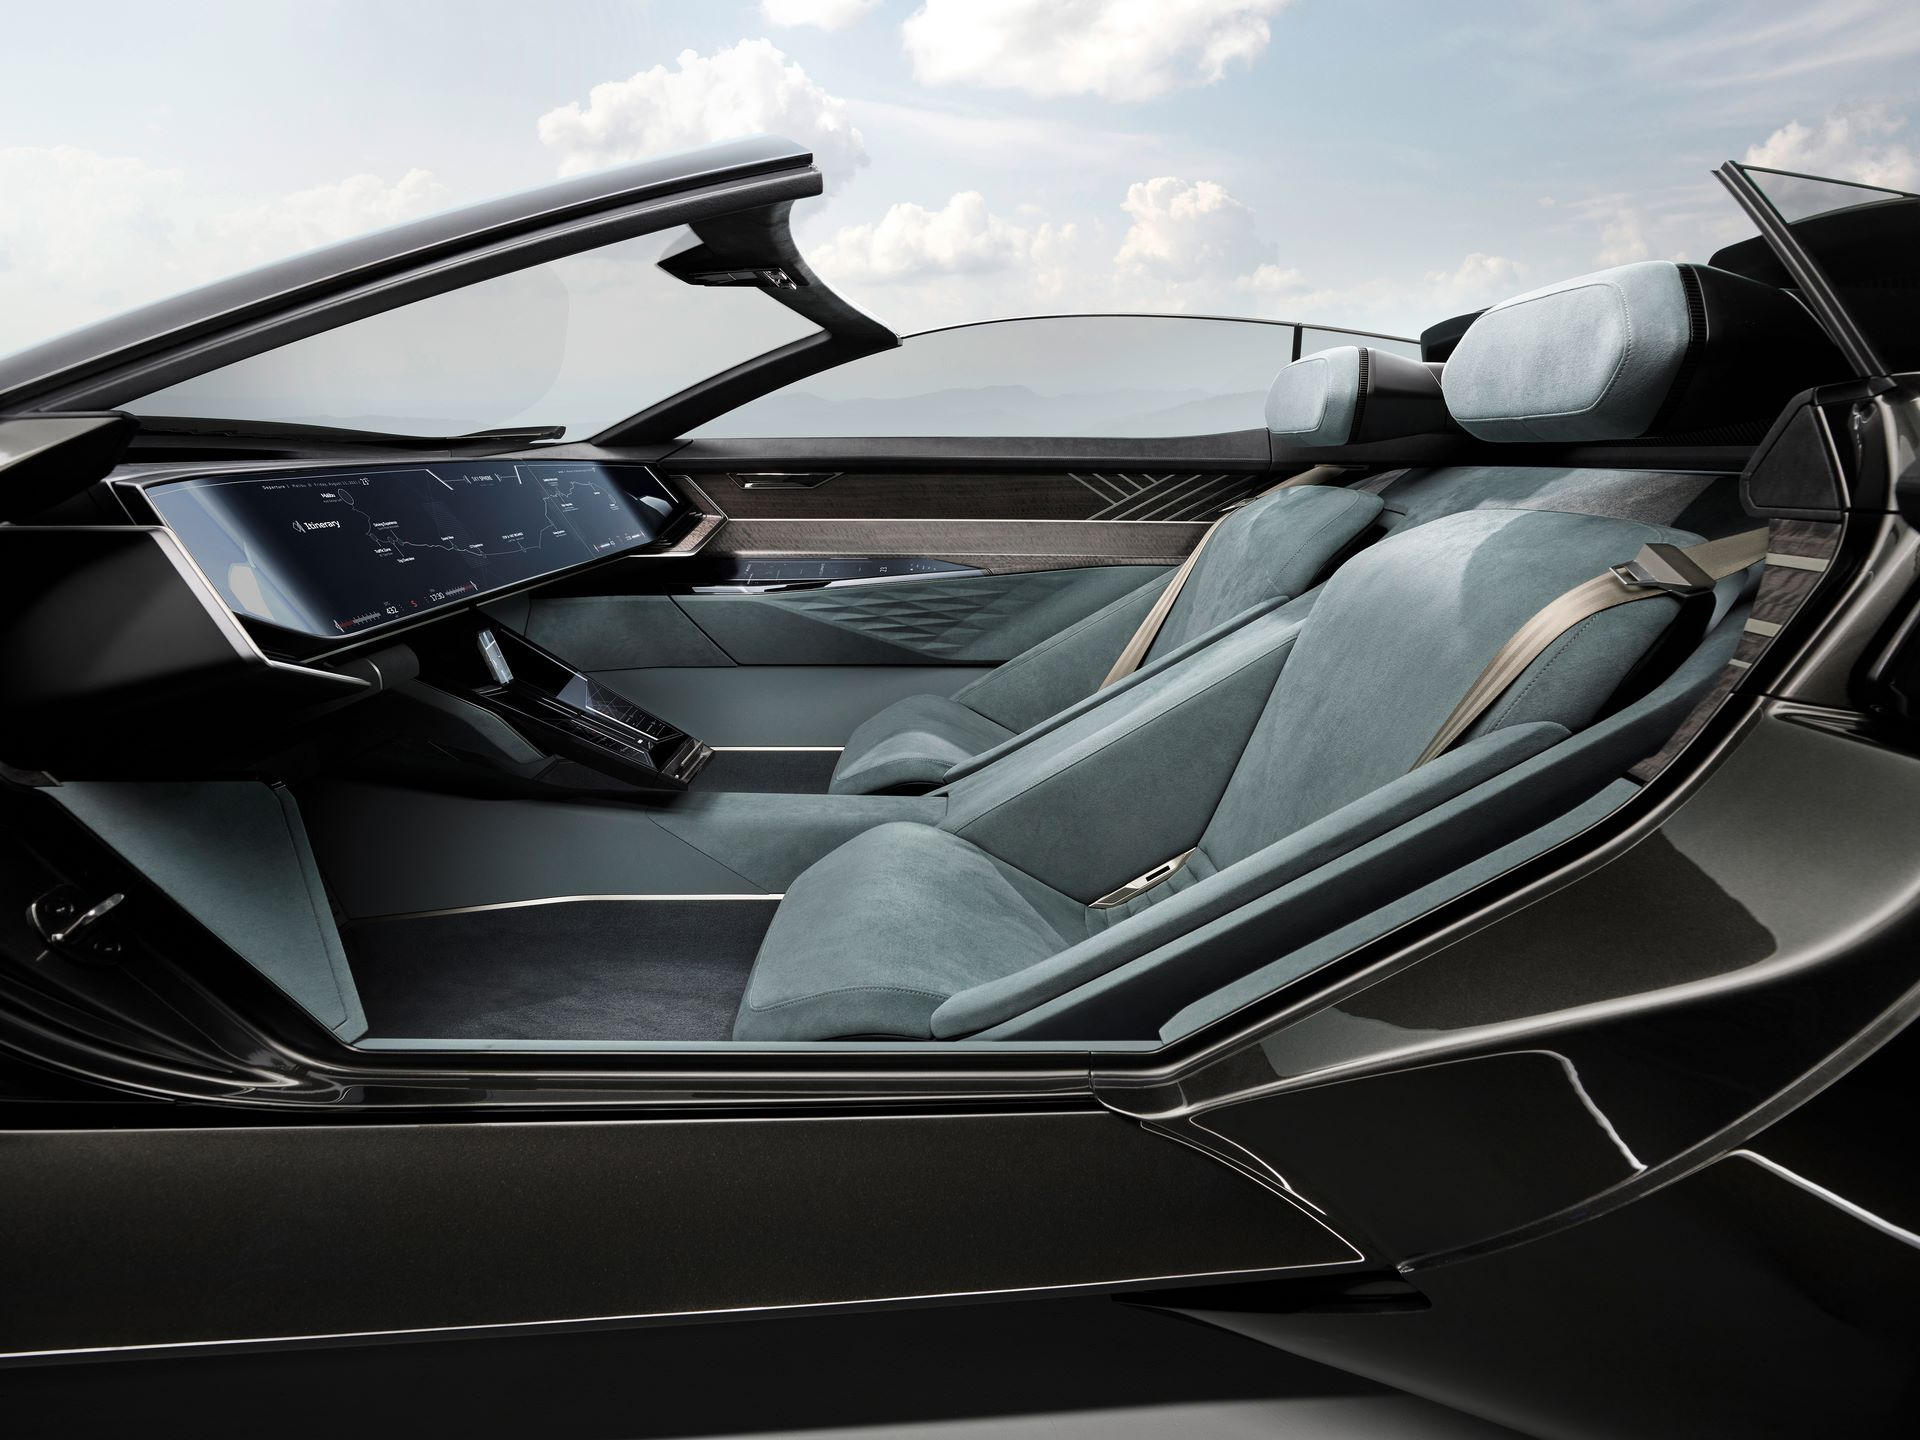 Audi-Skysphere-Concept-71